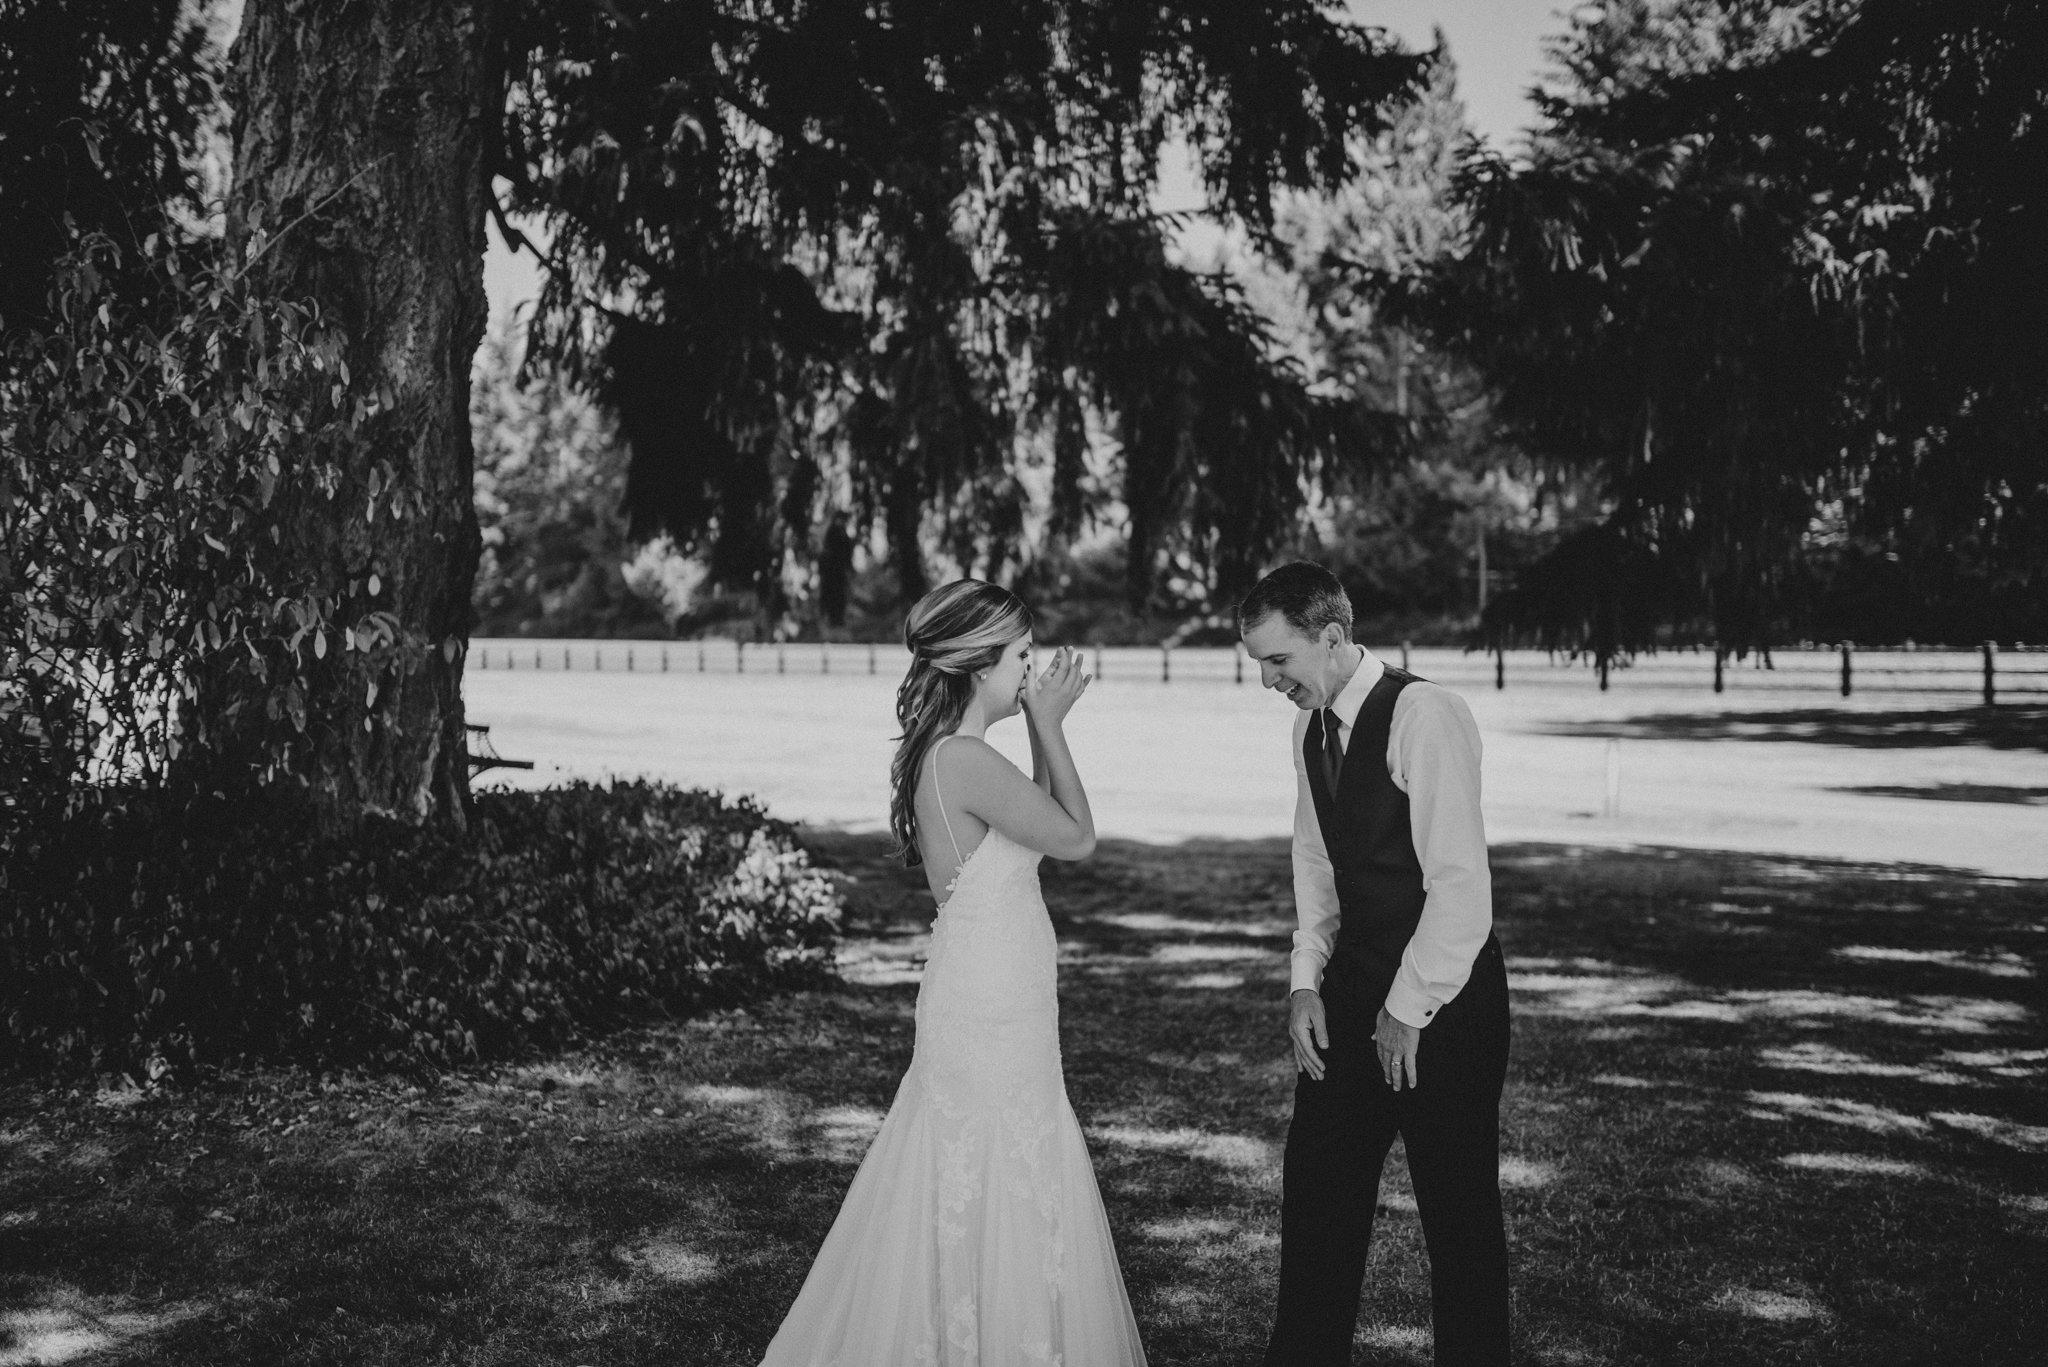 kristen-and-cody-the-kelley-farm-wedding-seattle-photographer-caitlyn-nikula-28.jpg